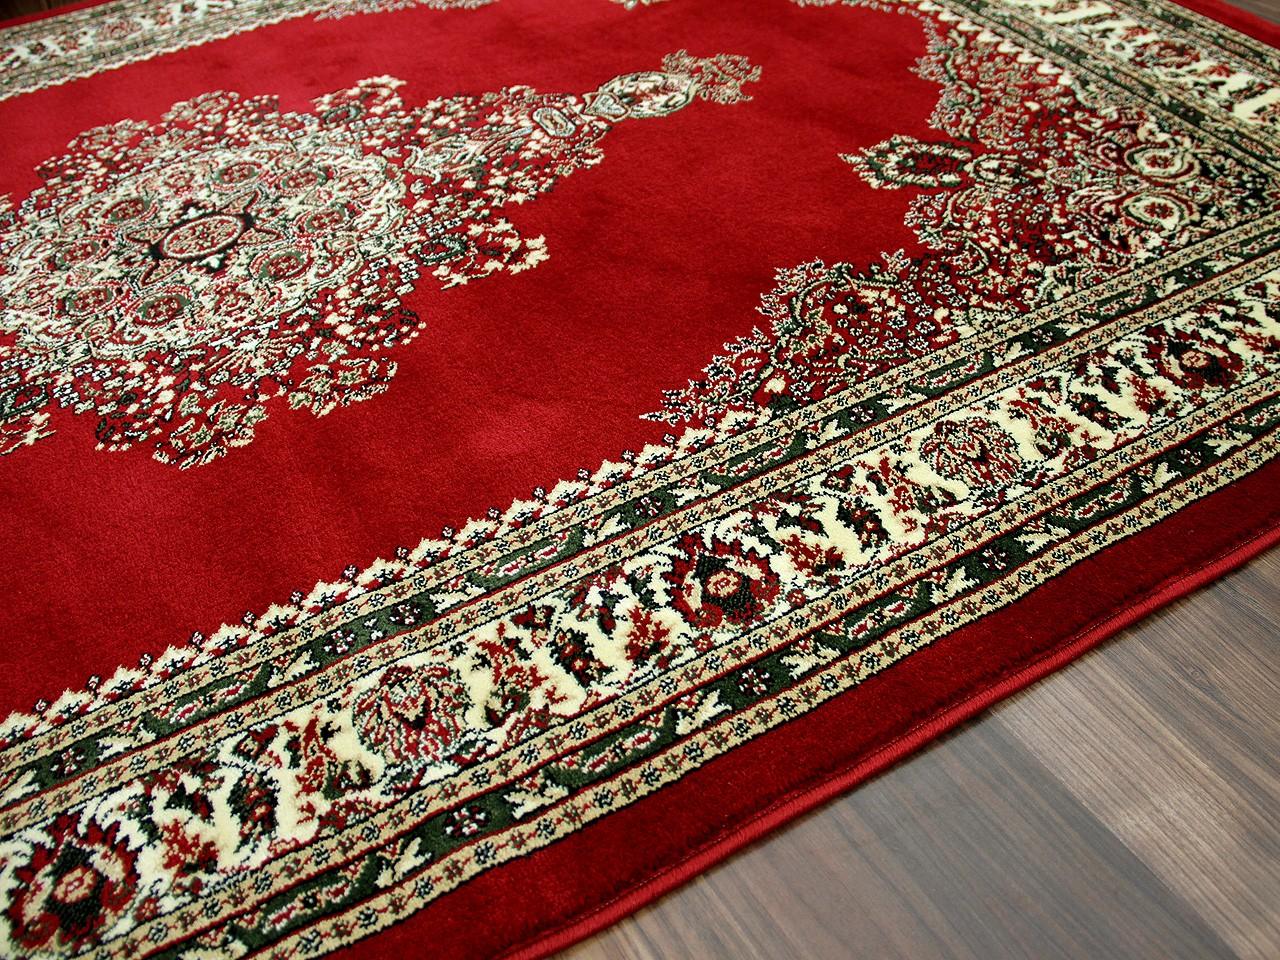 orient teppich marrakesh rot keshan teppiche orientteppiche marrakesh orientteppiche. Black Bedroom Furniture Sets. Home Design Ideas